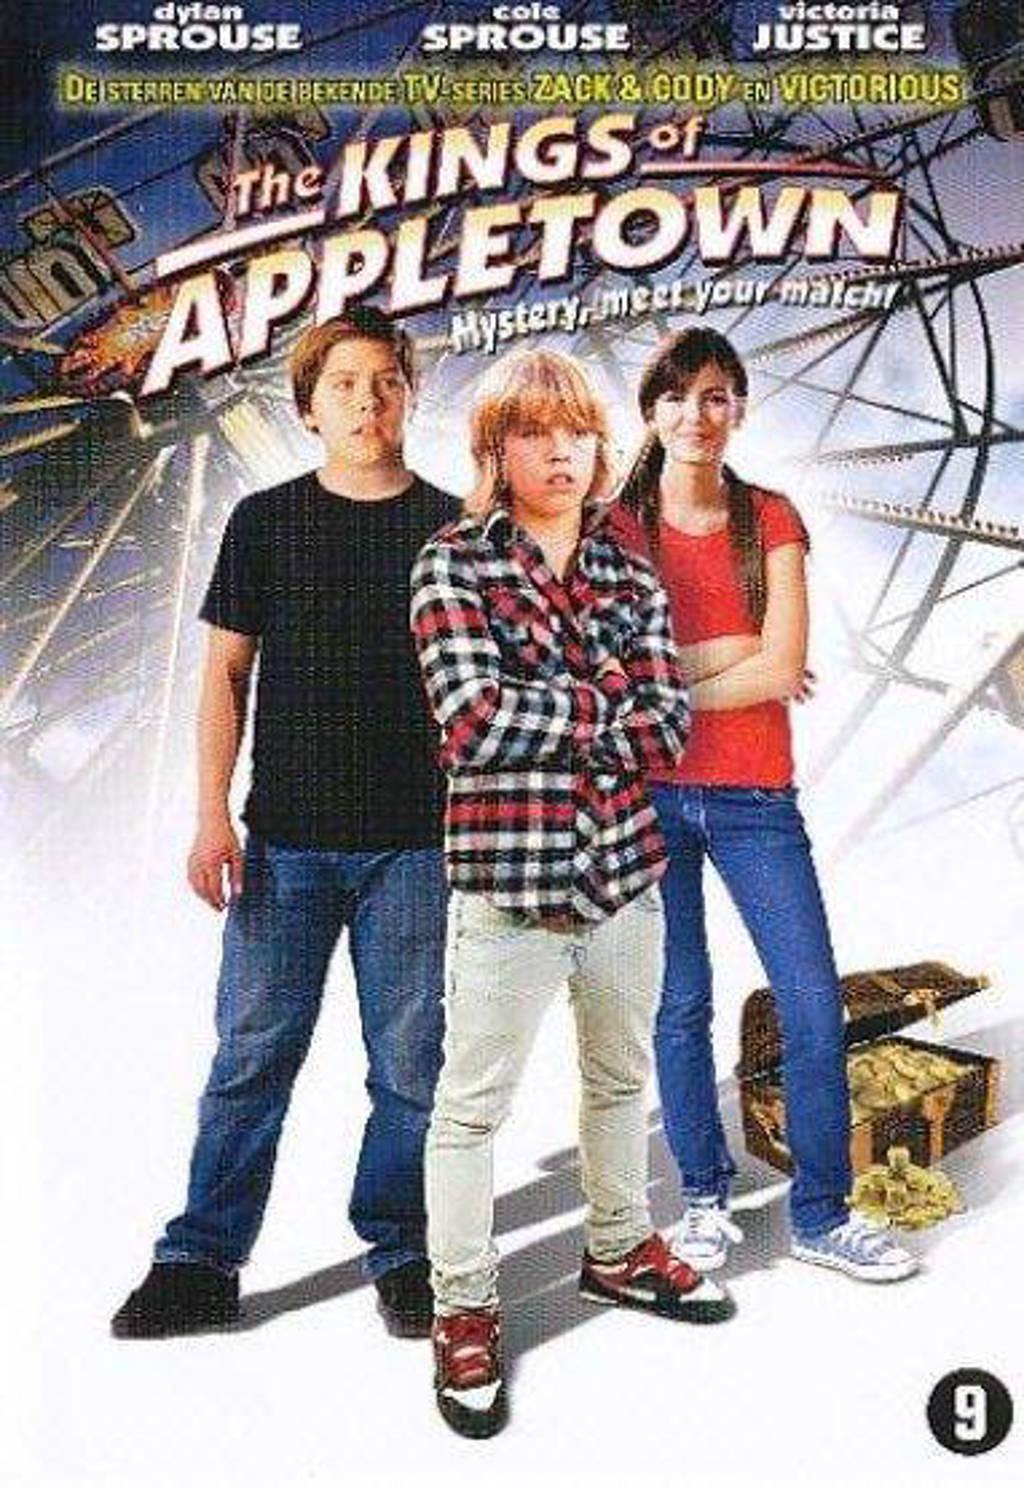 Kings of appletown (DVD)